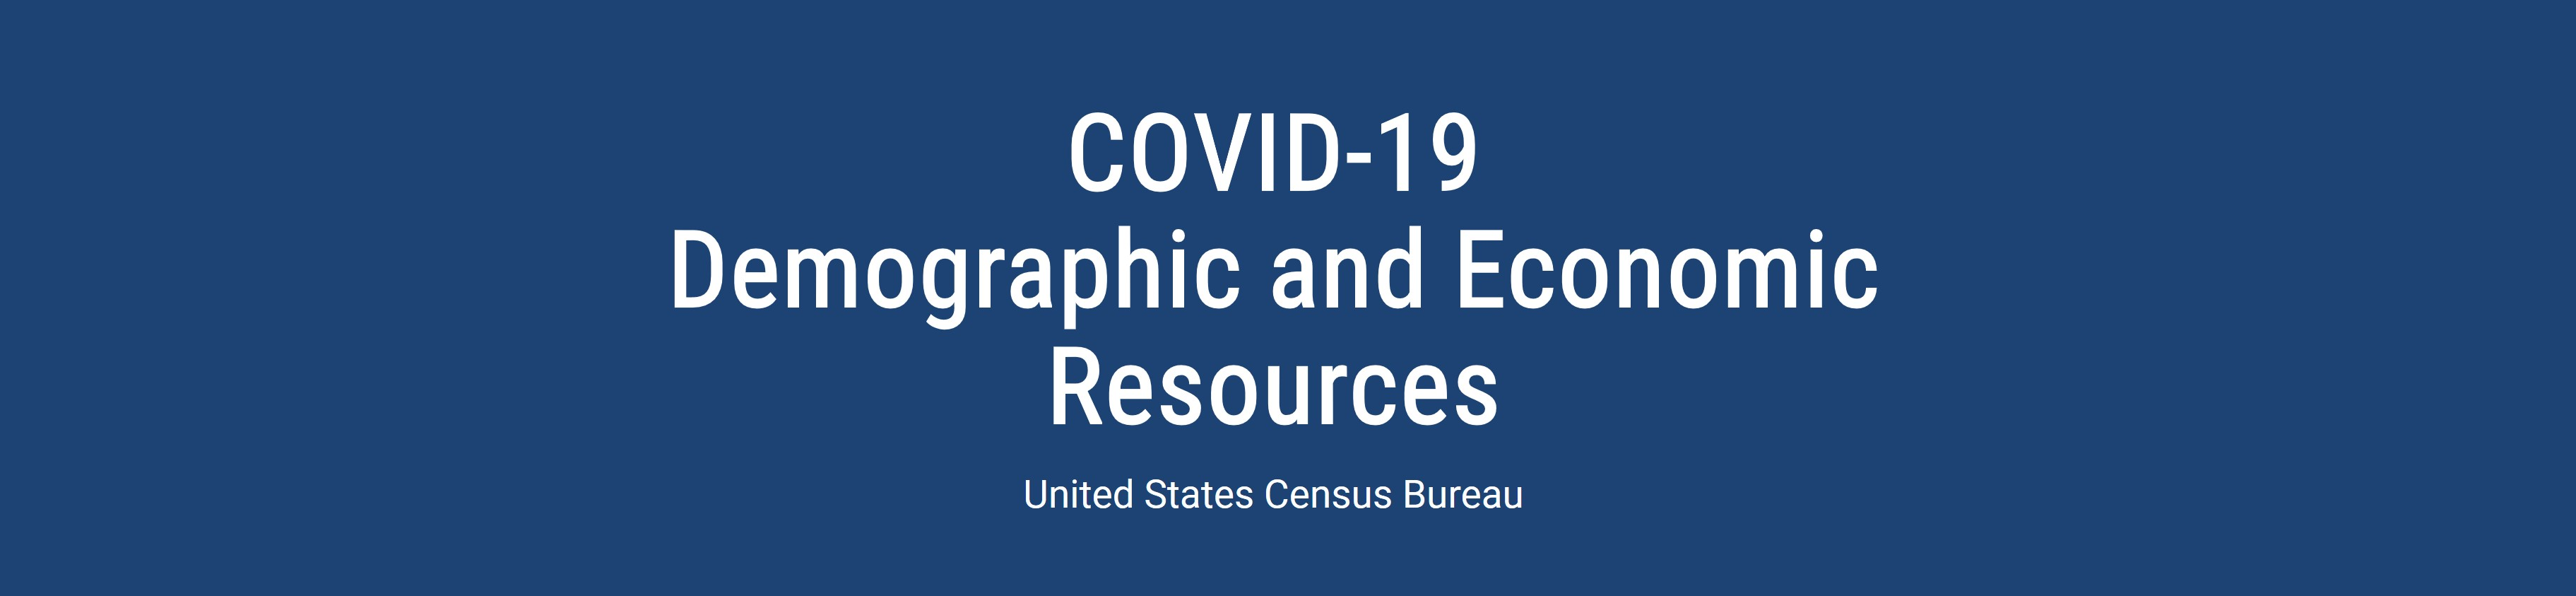 COVID-19 Demographic and Economic Resources